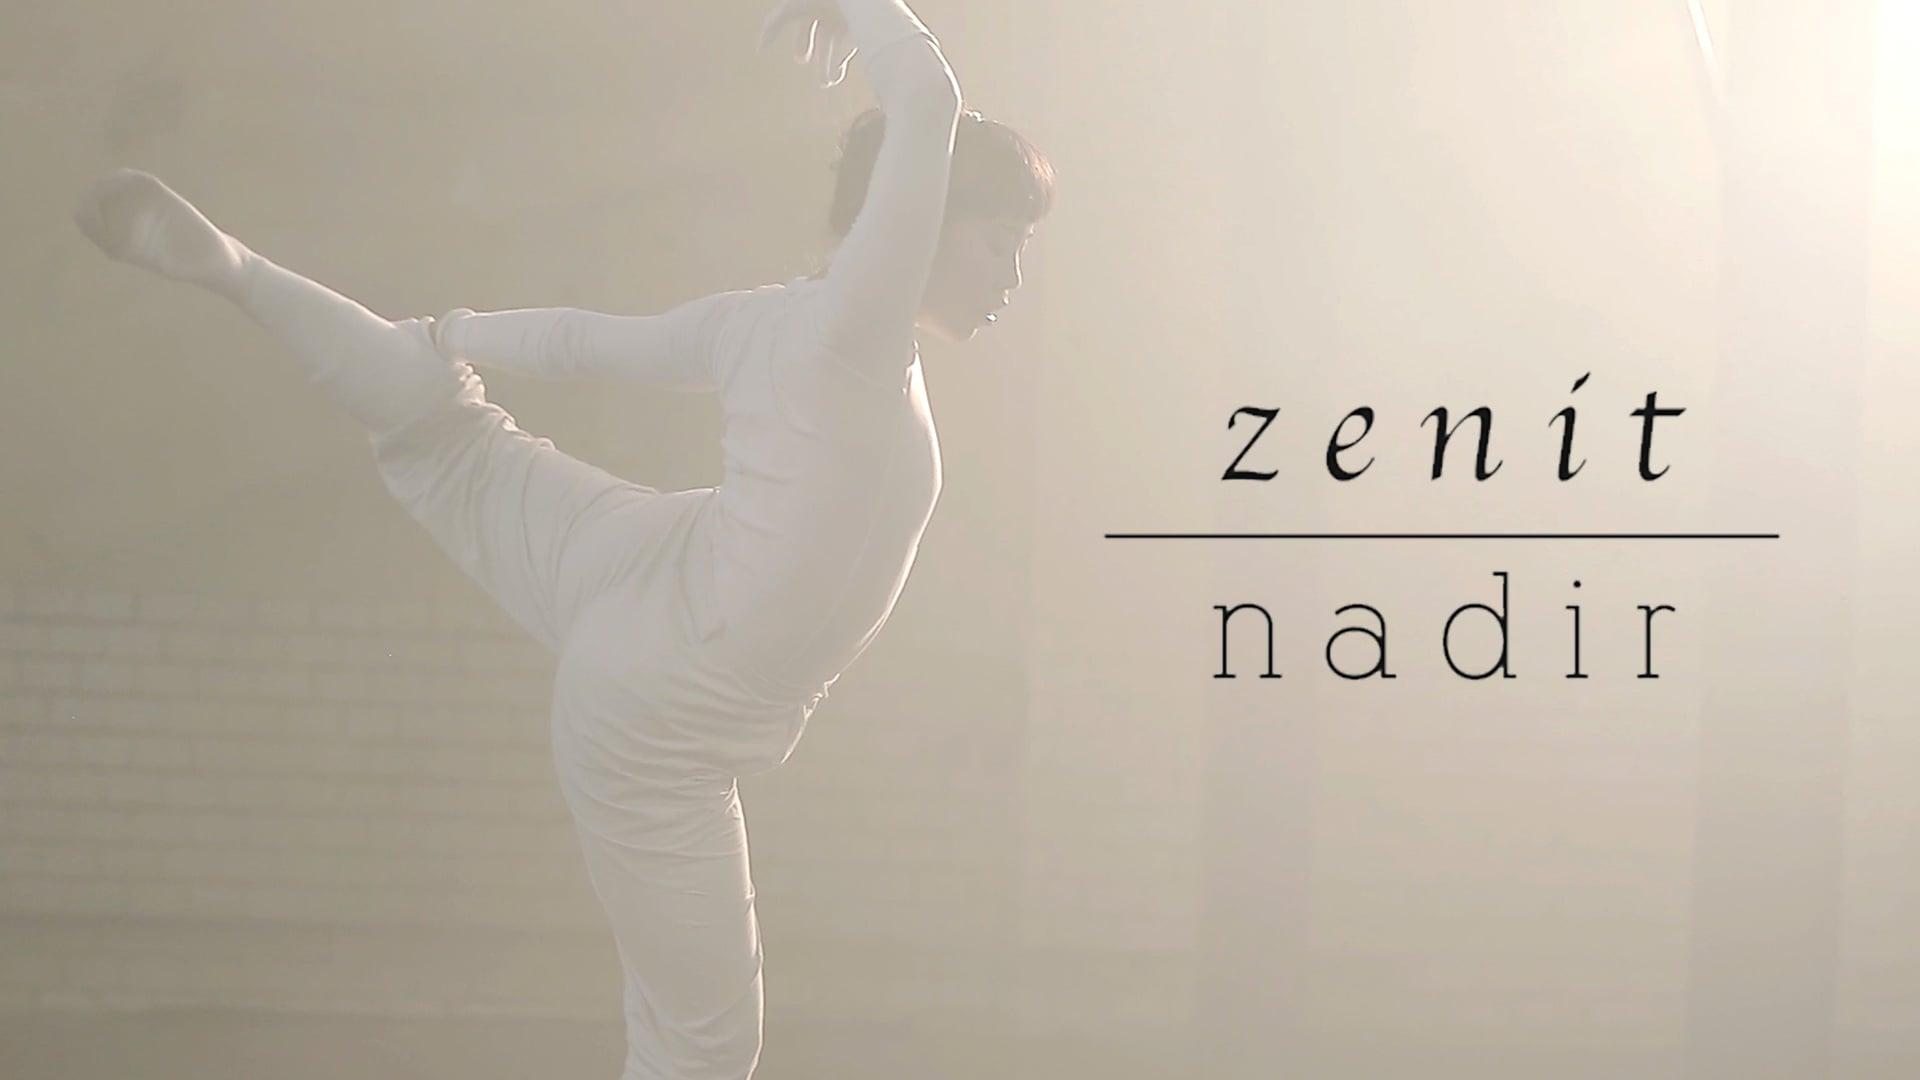 zenit_nadir - Contemporary Dance (2015)